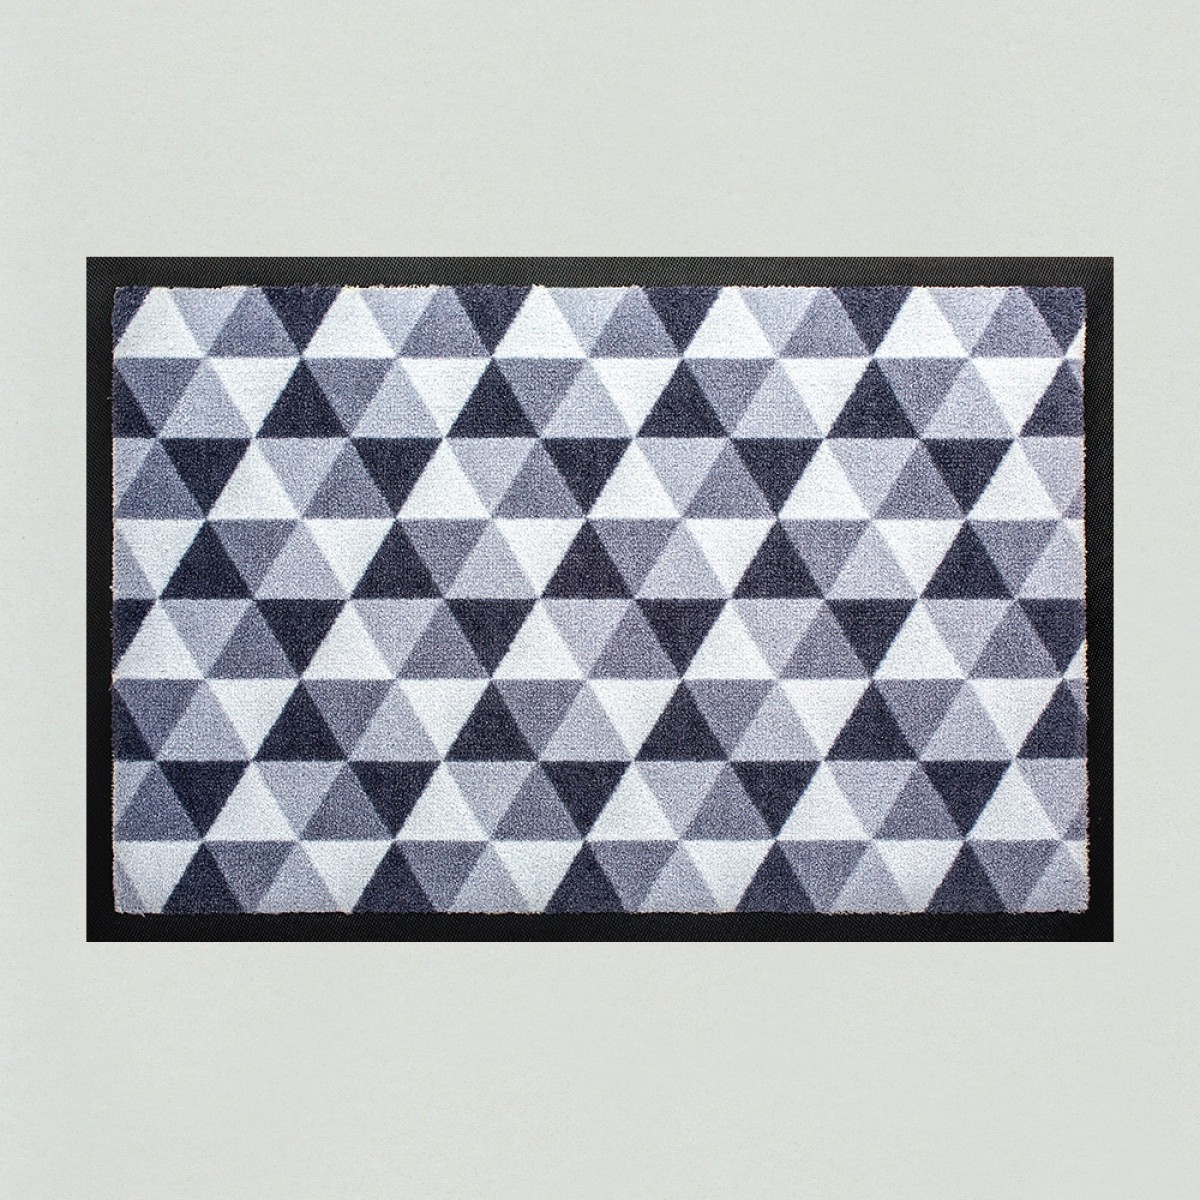 fu matte dreiecke grau kaufen verschiedene gr en mattenkiste. Black Bedroom Furniture Sets. Home Design Ideas